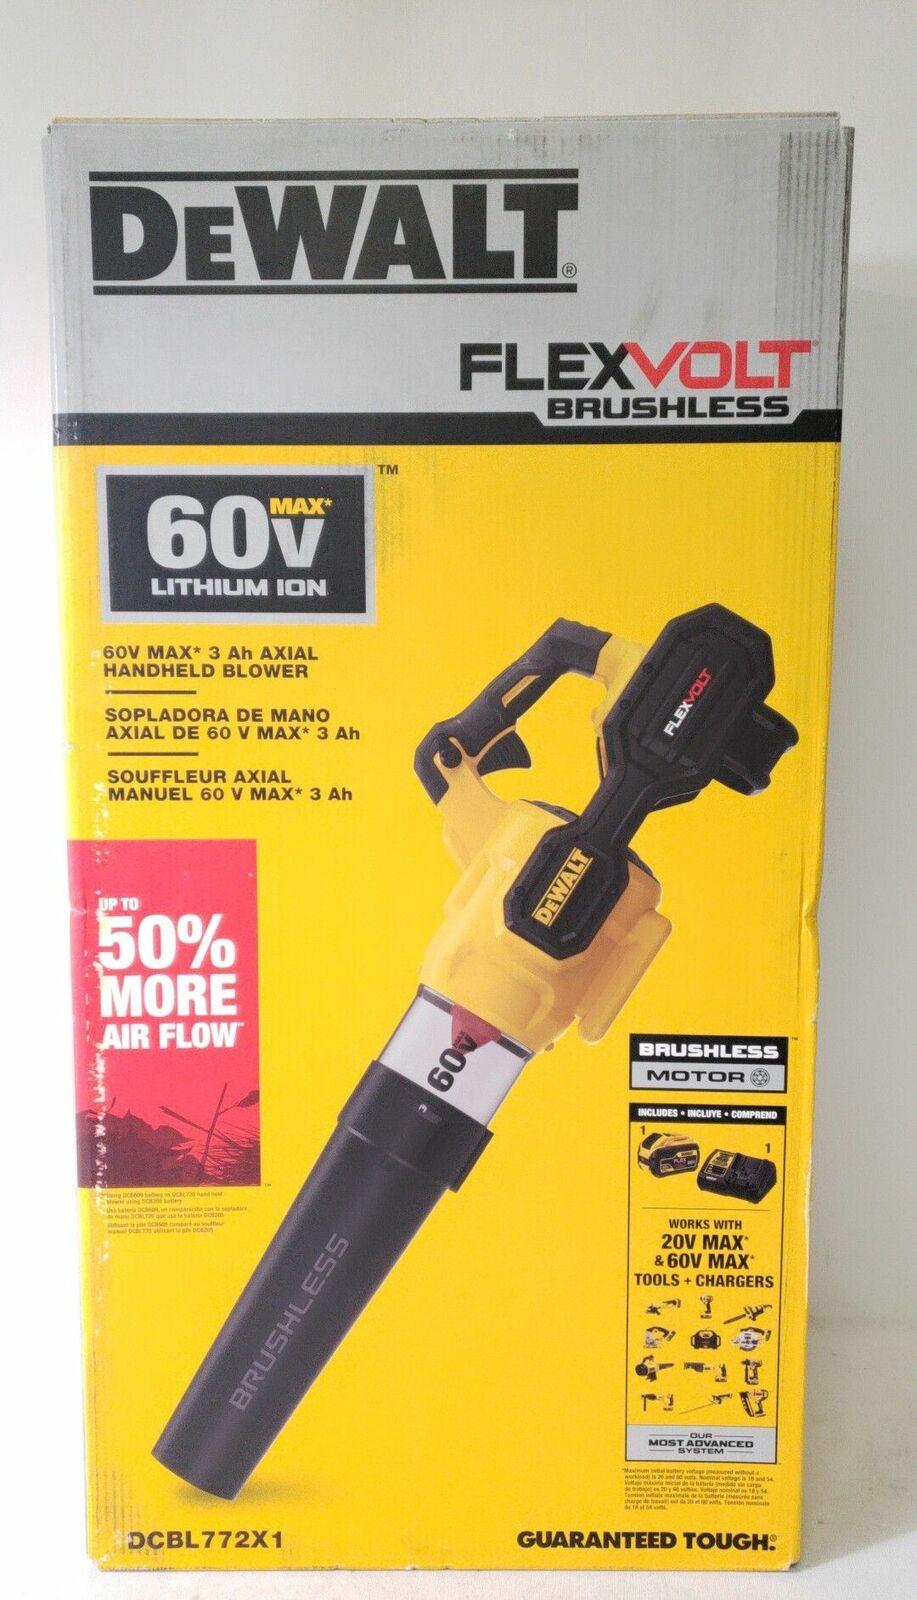 DEWALT DCBL772X1 60V Flexvolt Brushless Handheld Axial Blowe